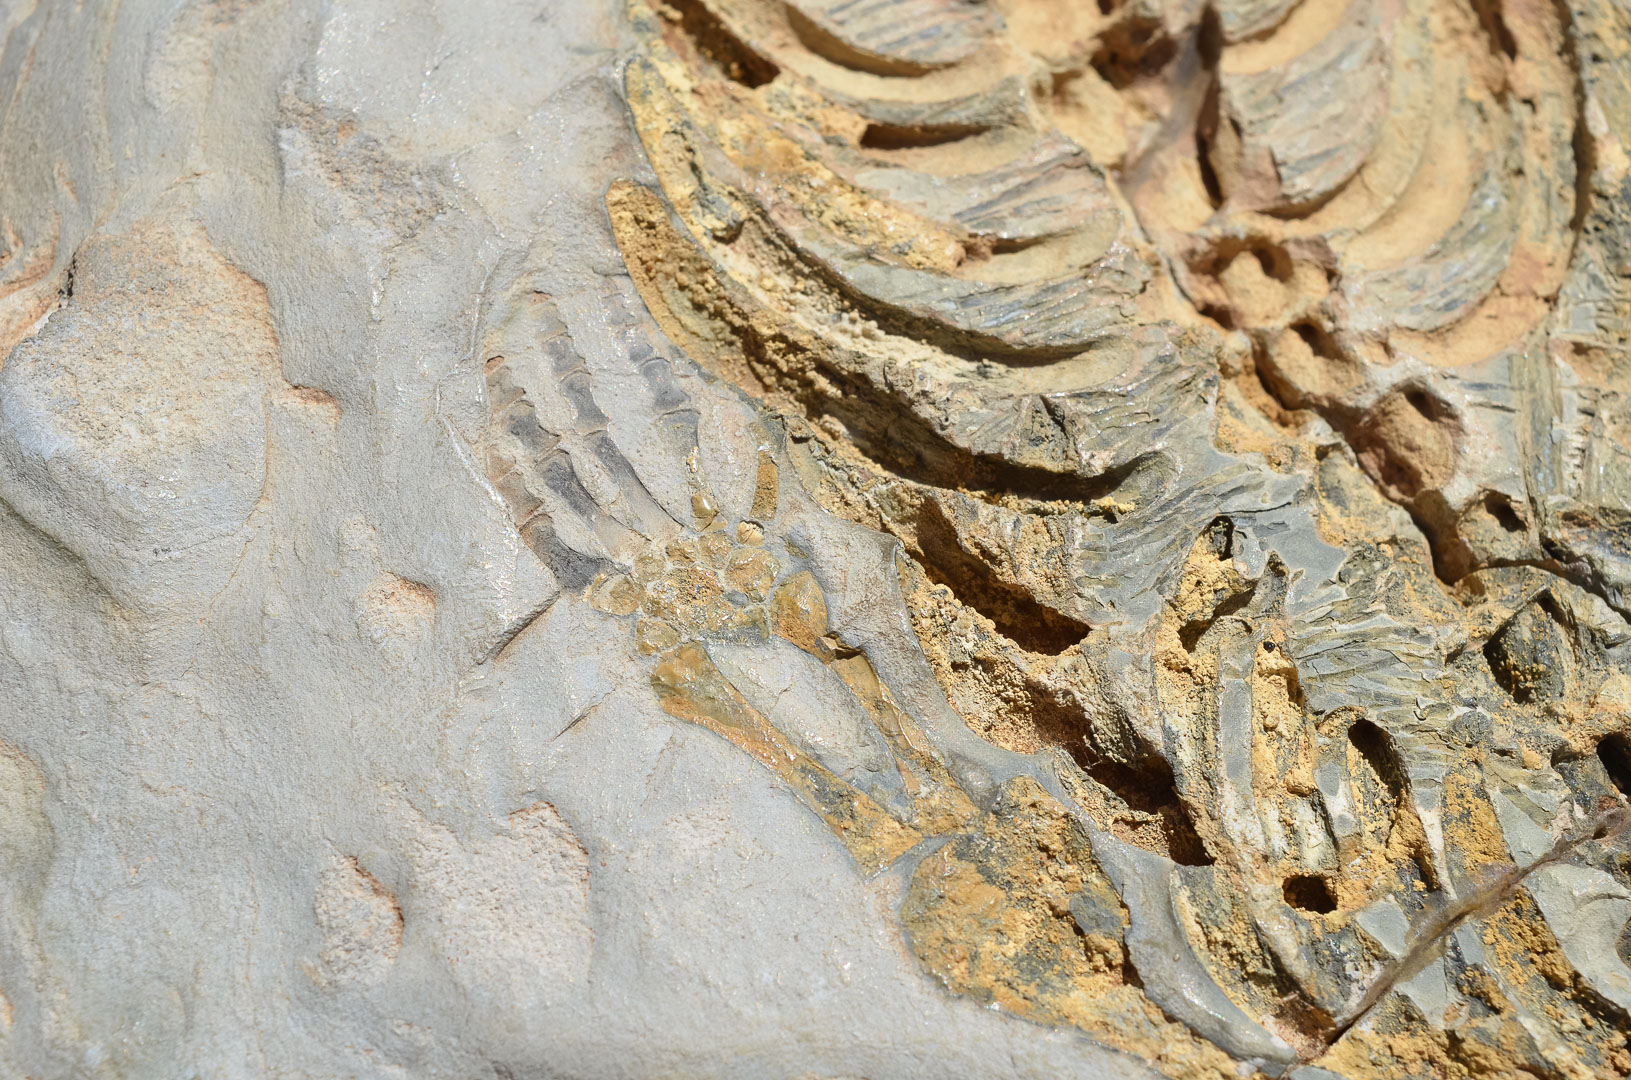 versteinerter Mesosaurus